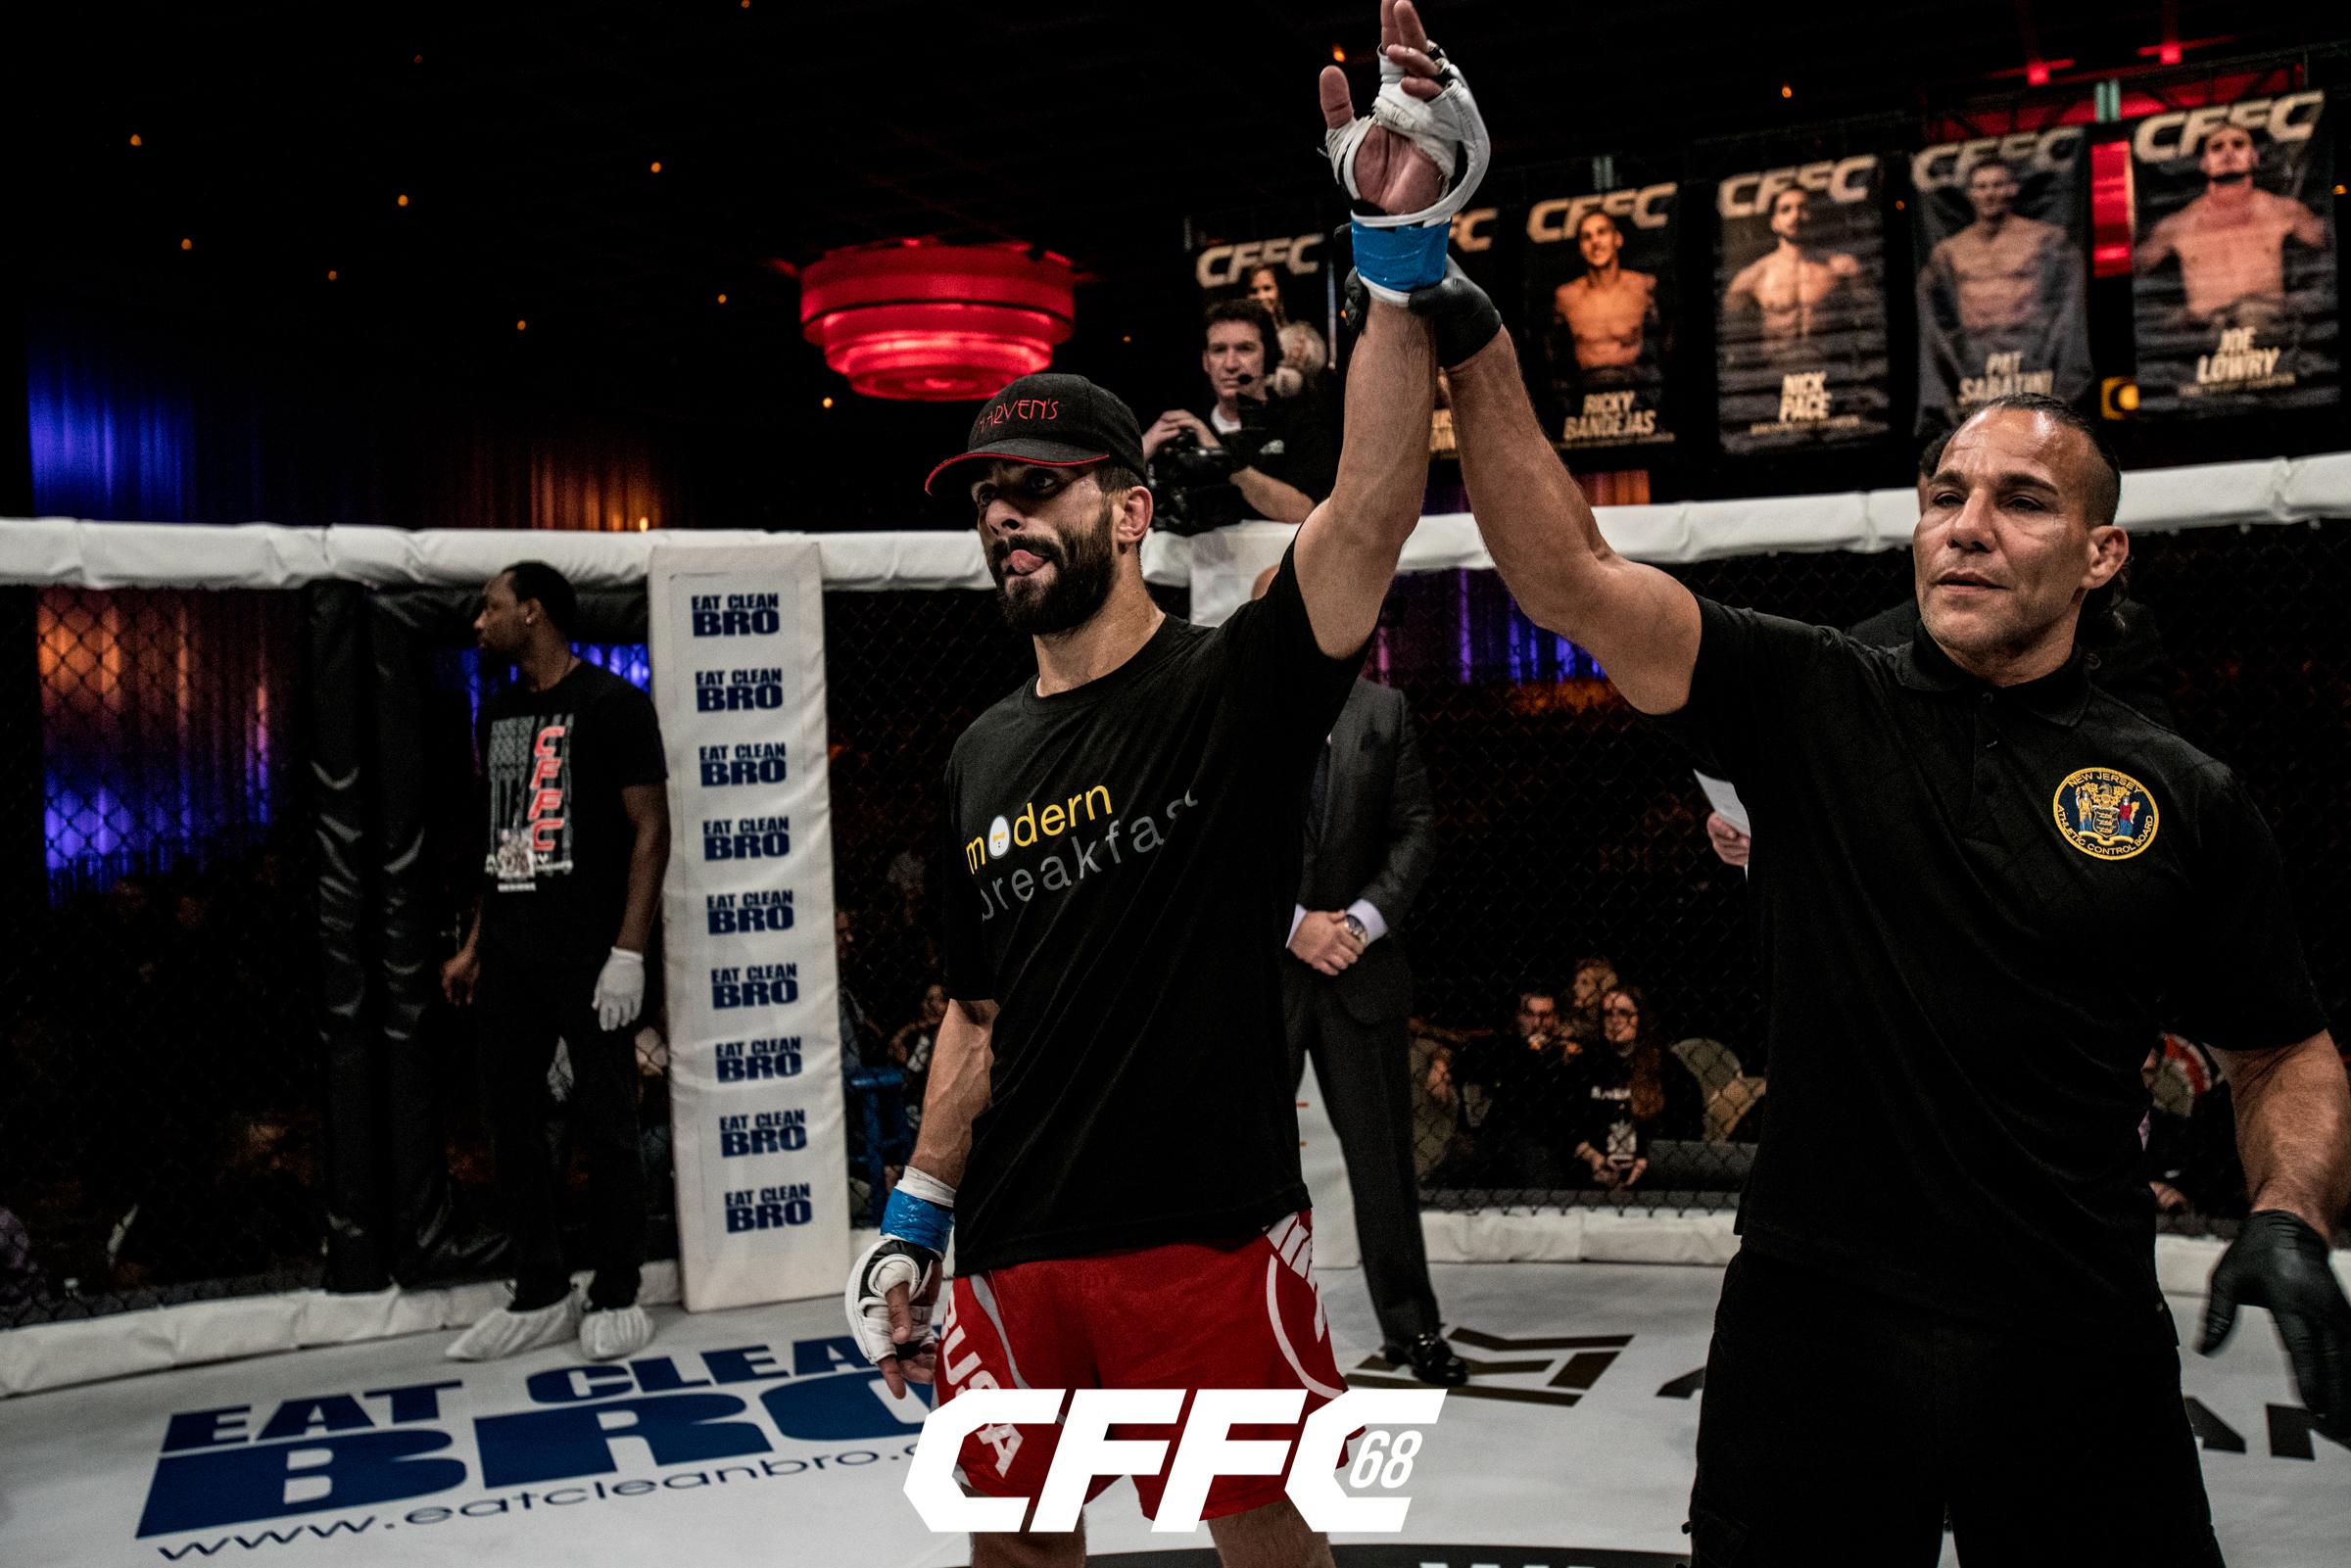 CFFC 68 Fight Night-1.jpg